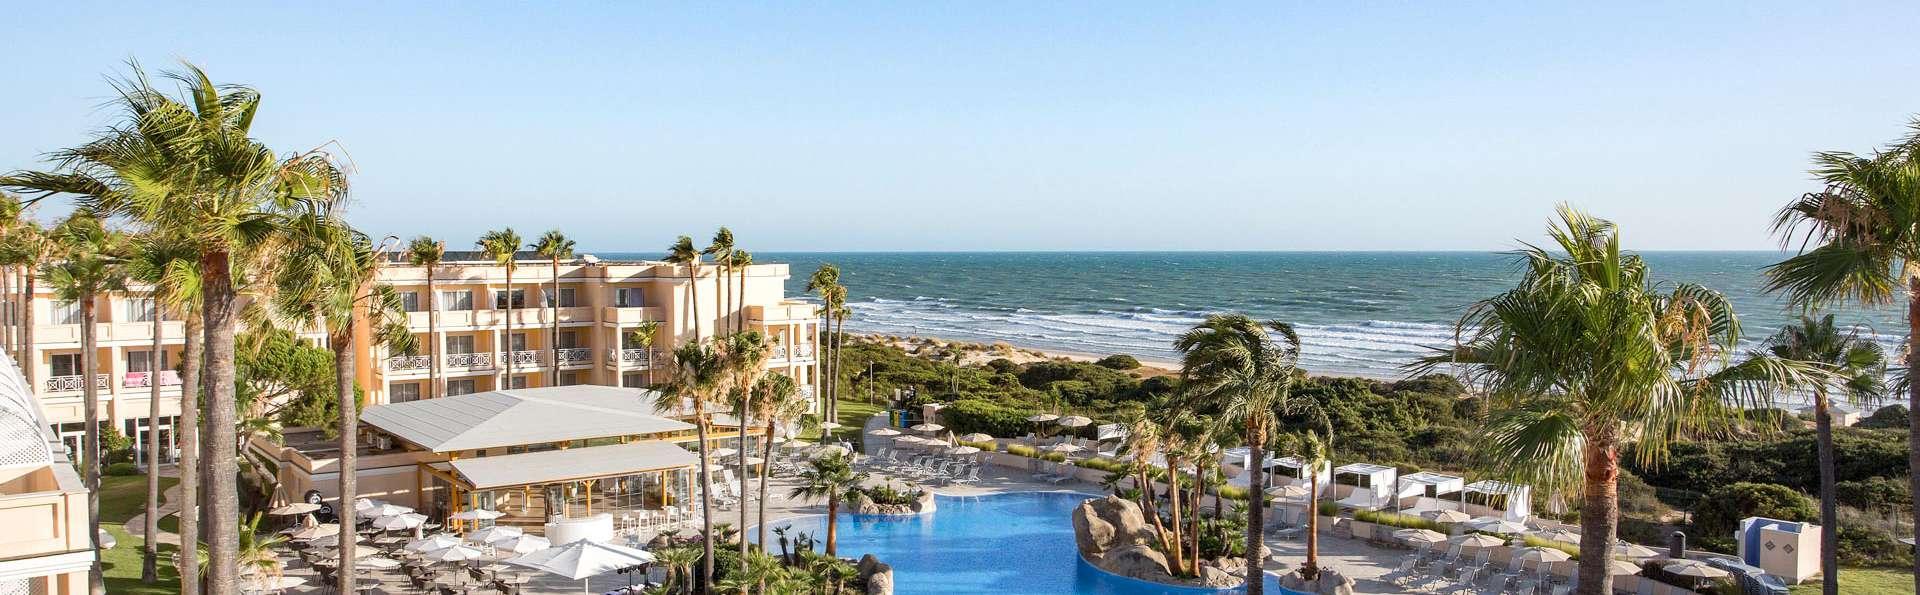 Hipotels Playa La Barrosa (Adults Only) - EDIT_VIEW_03.jpg